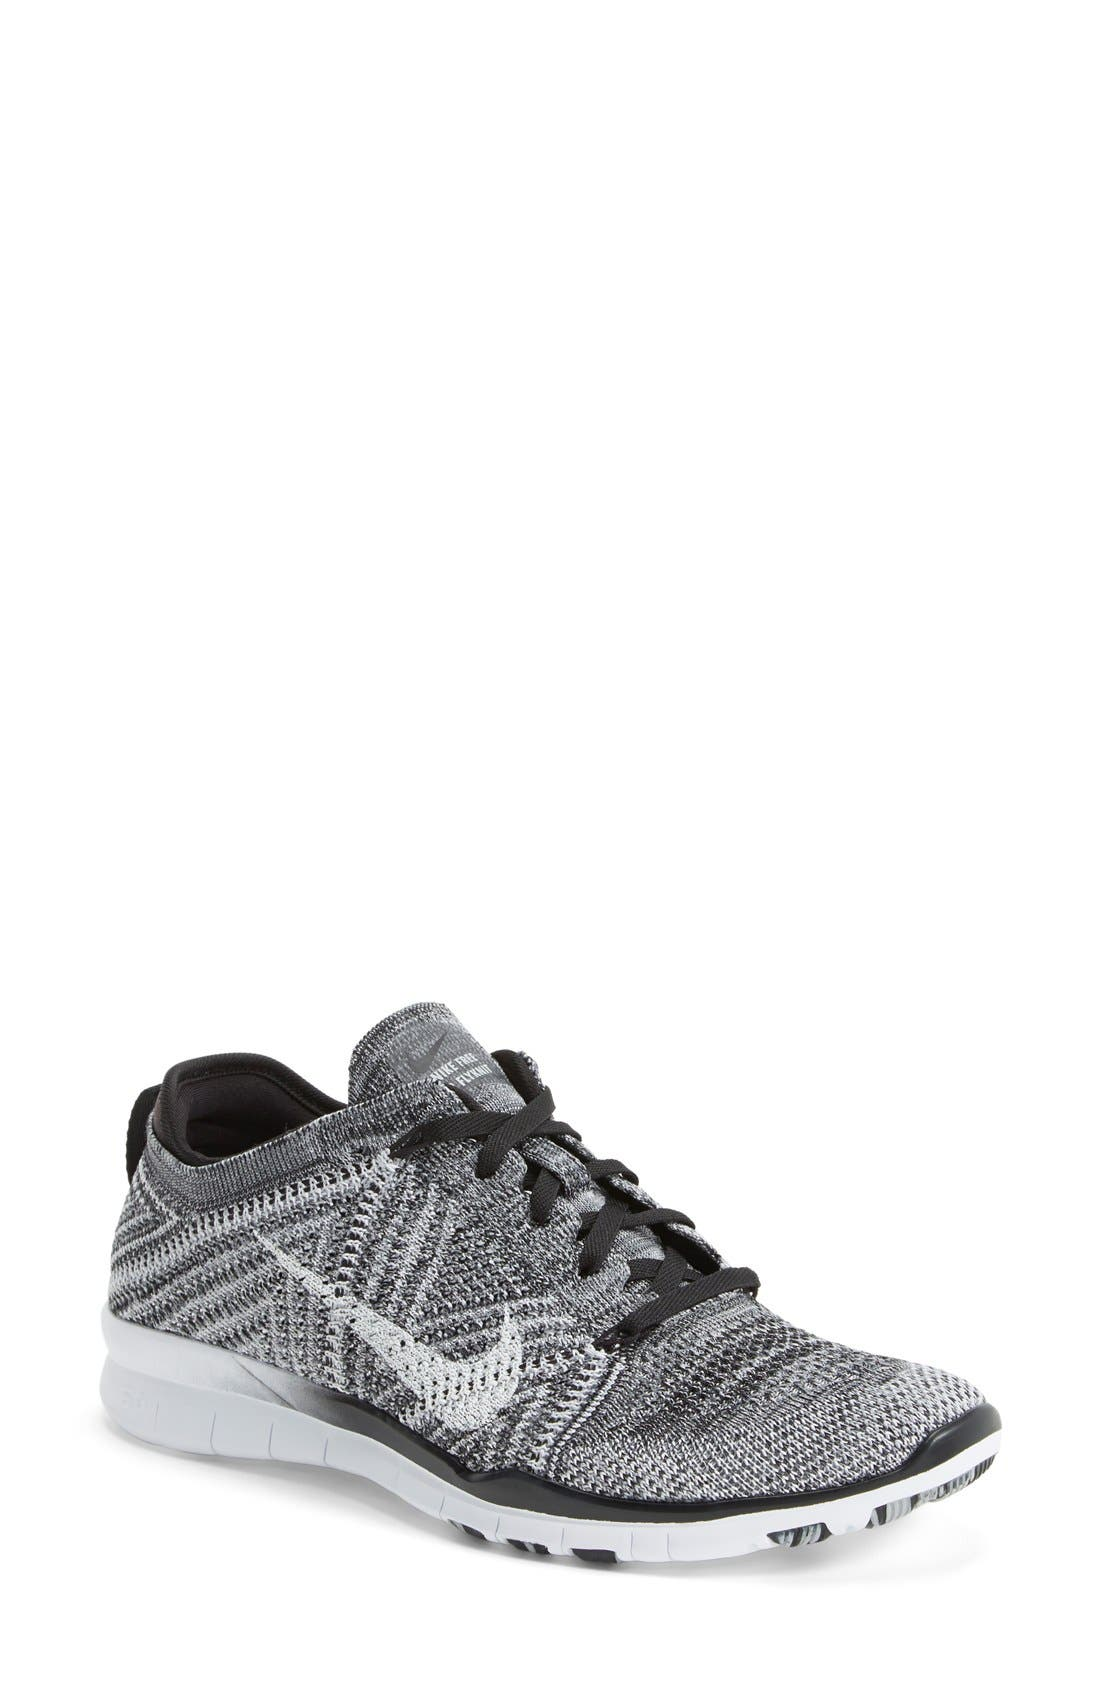 'Free Flyknit 5.0 TR' Training Shoe,                             Main thumbnail 1, color,                             Black/ Grey/ White